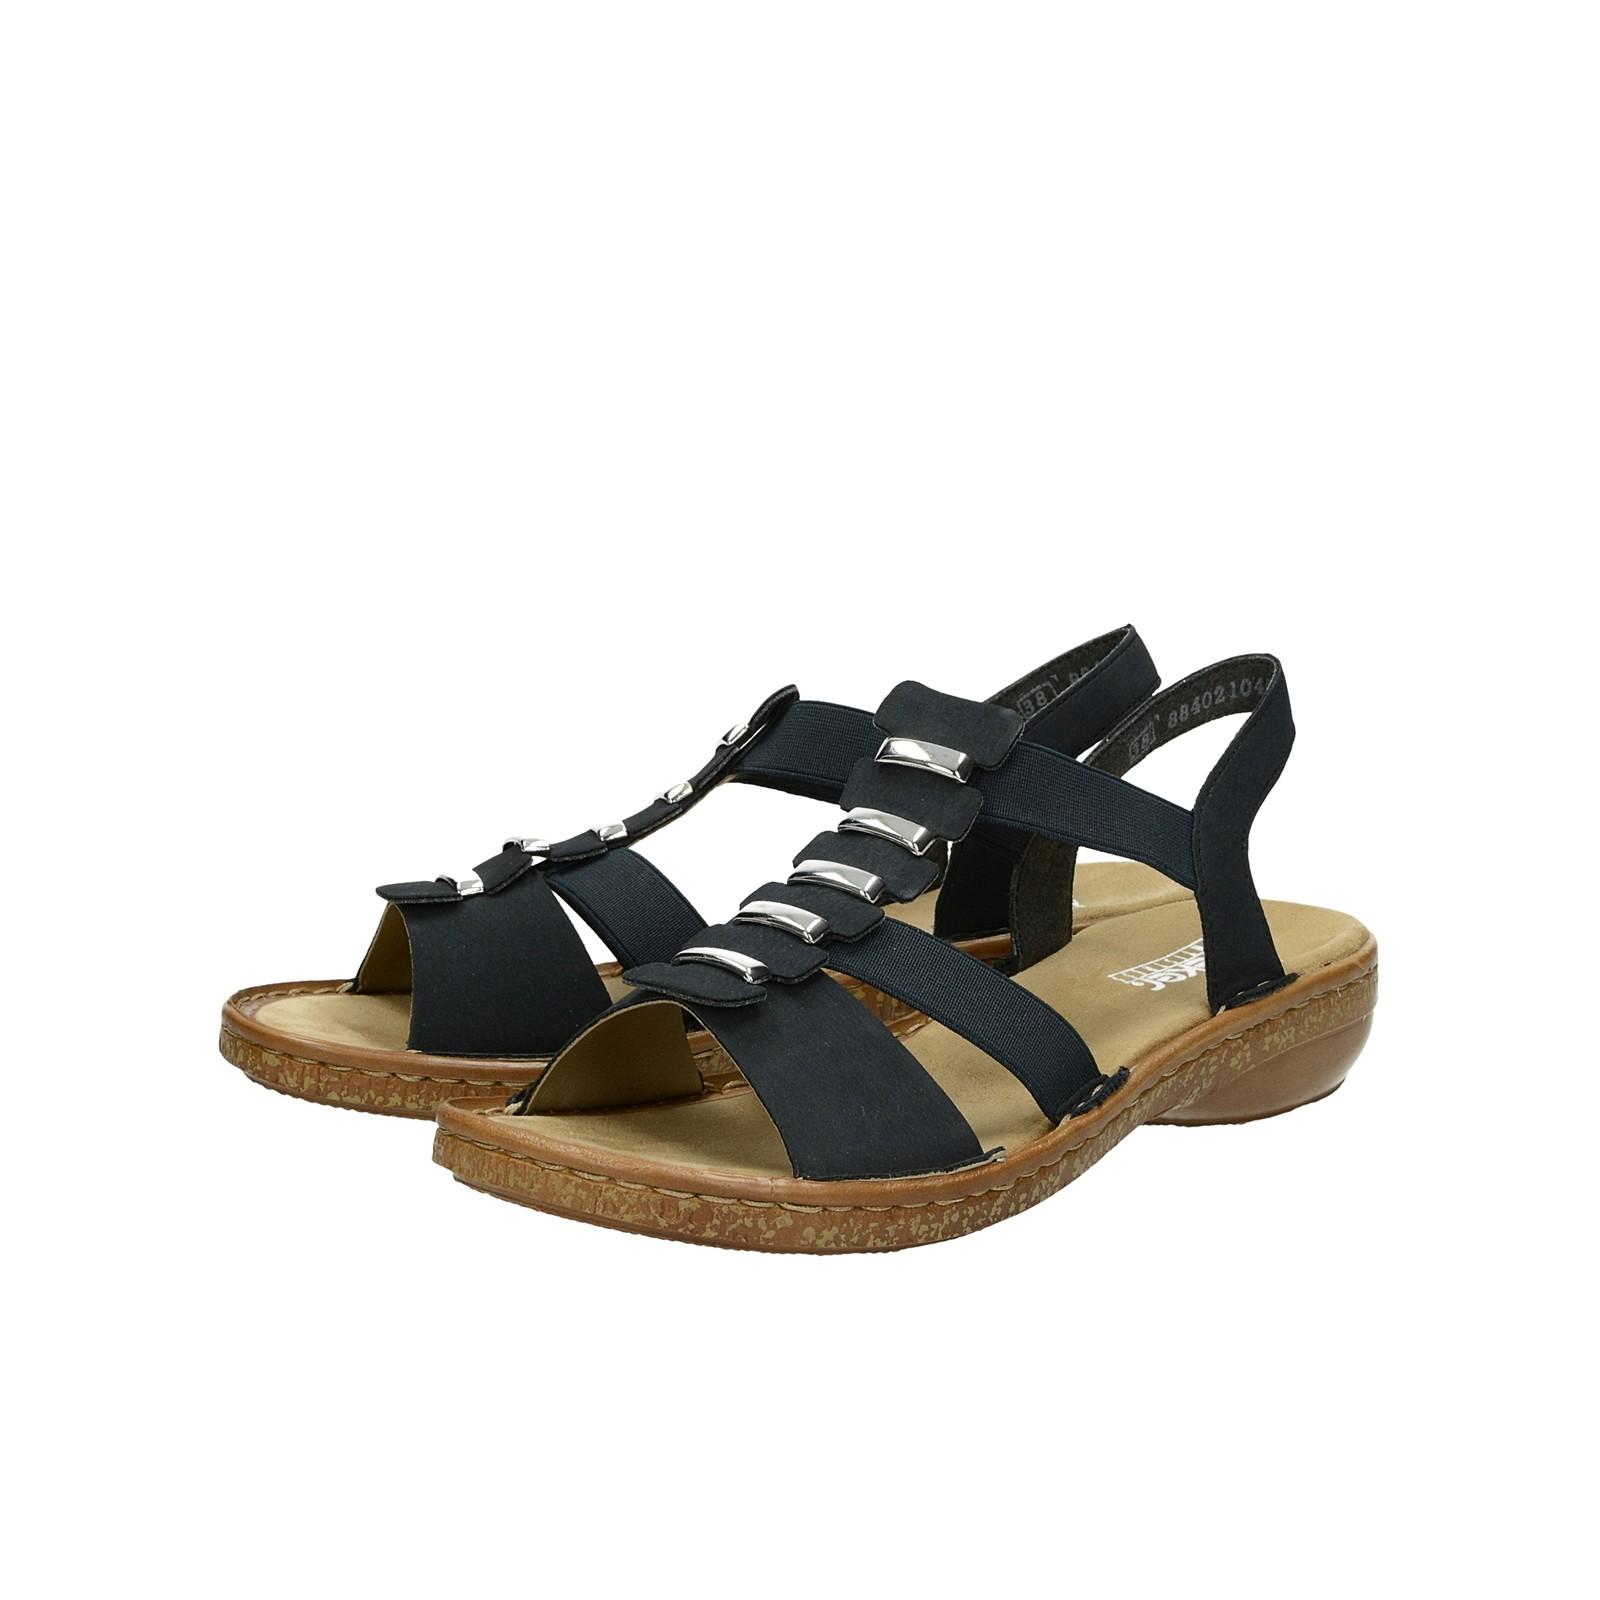 821a6d09ca66 Rieker dámske pohodlné sandále - tmavomodré ...